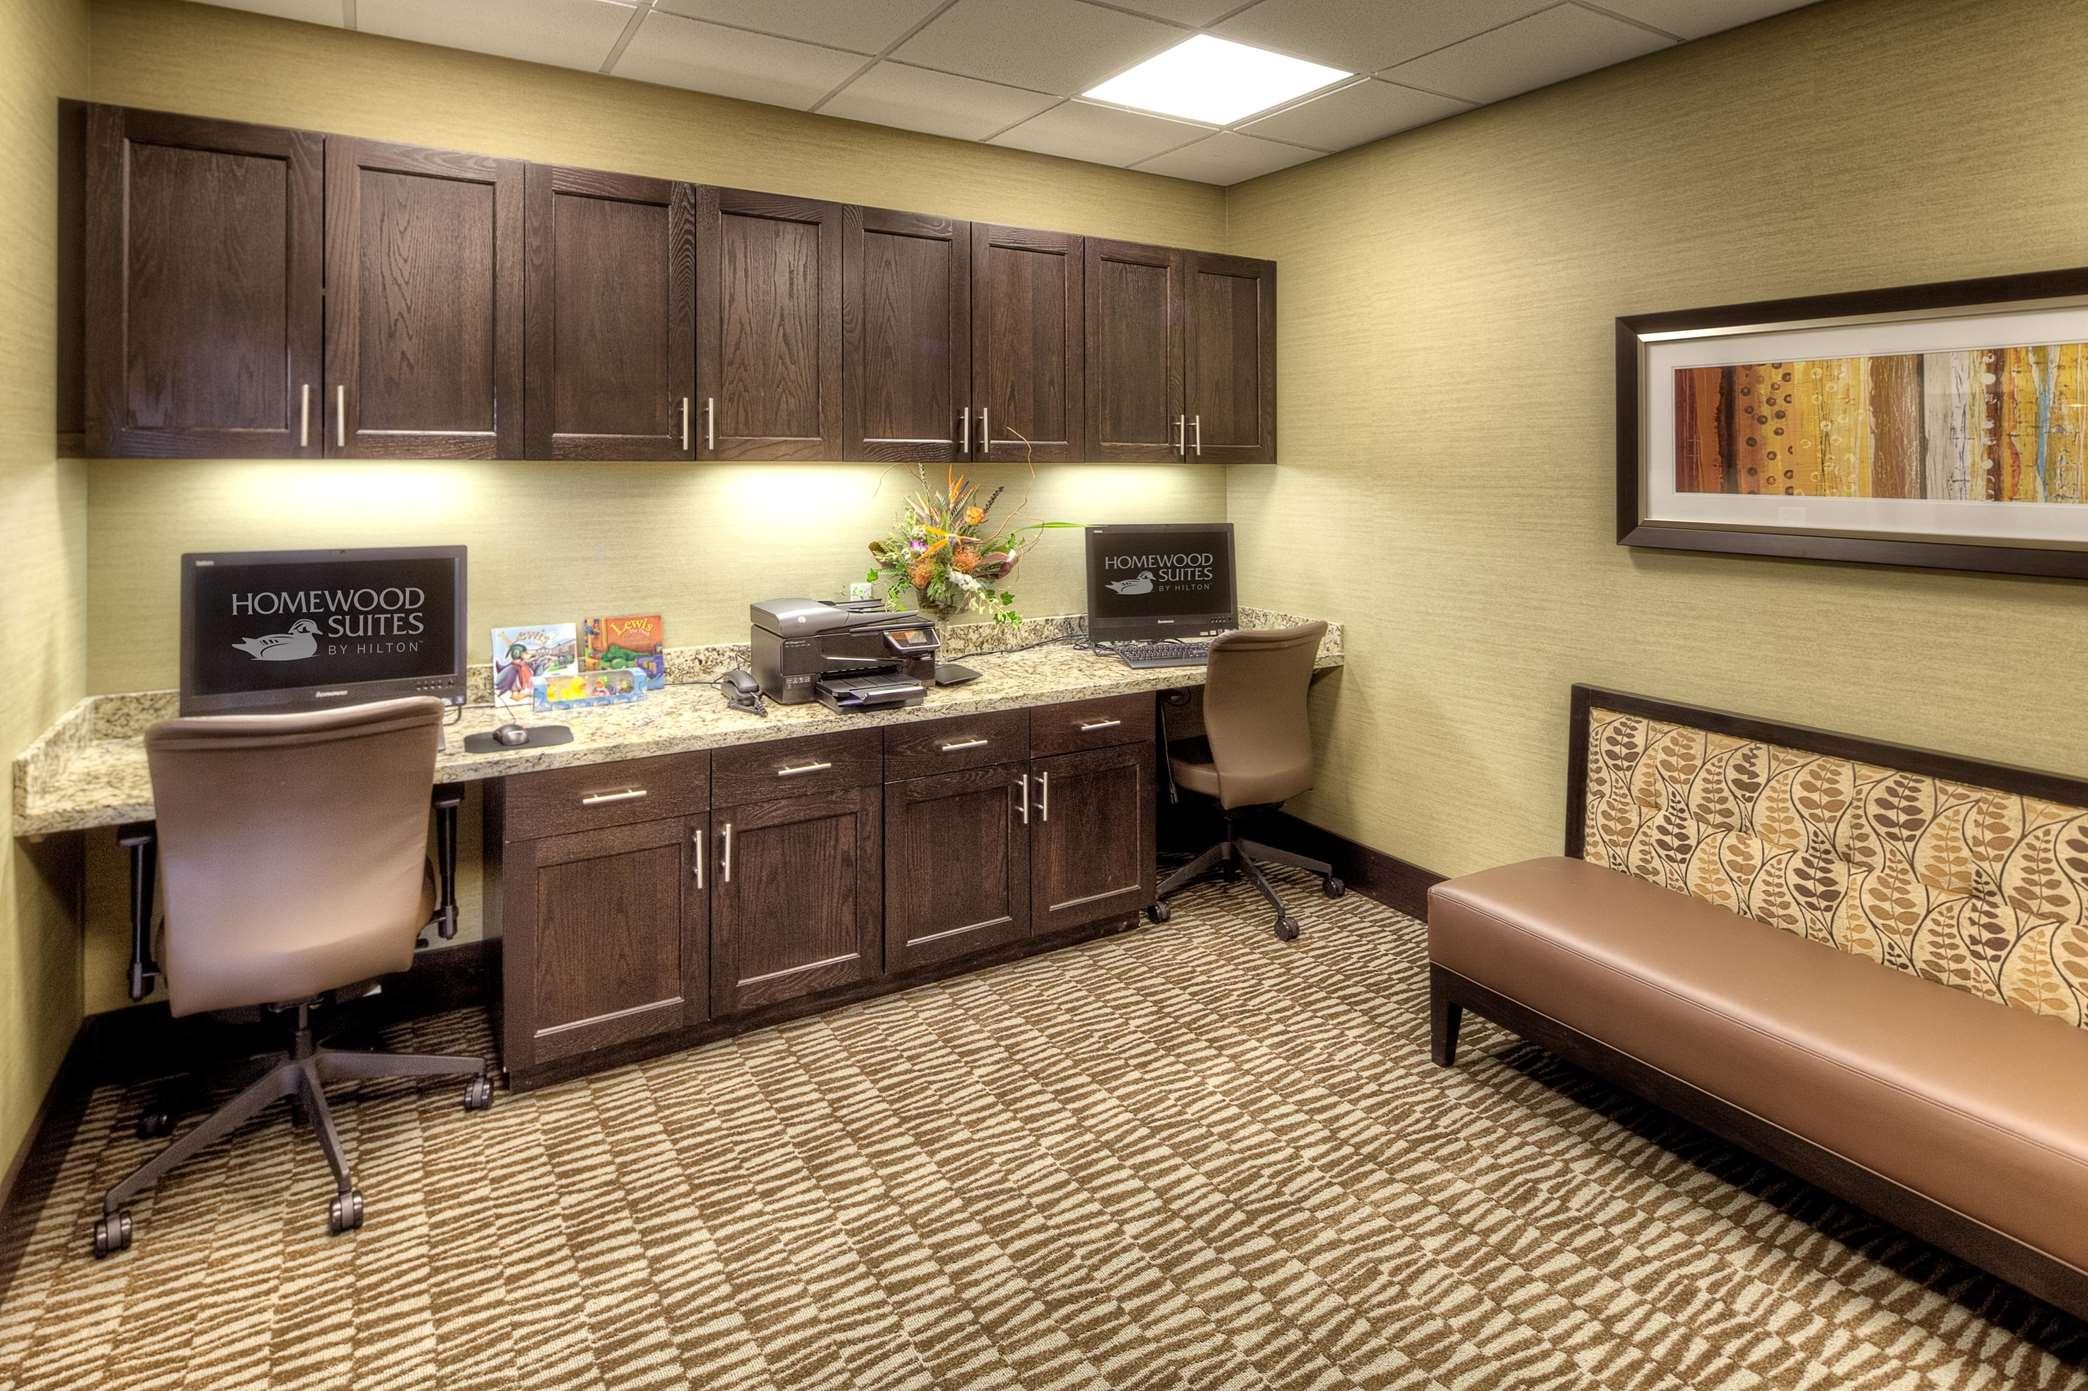 Homewood Suites by Hilton Victoria, TX image 19